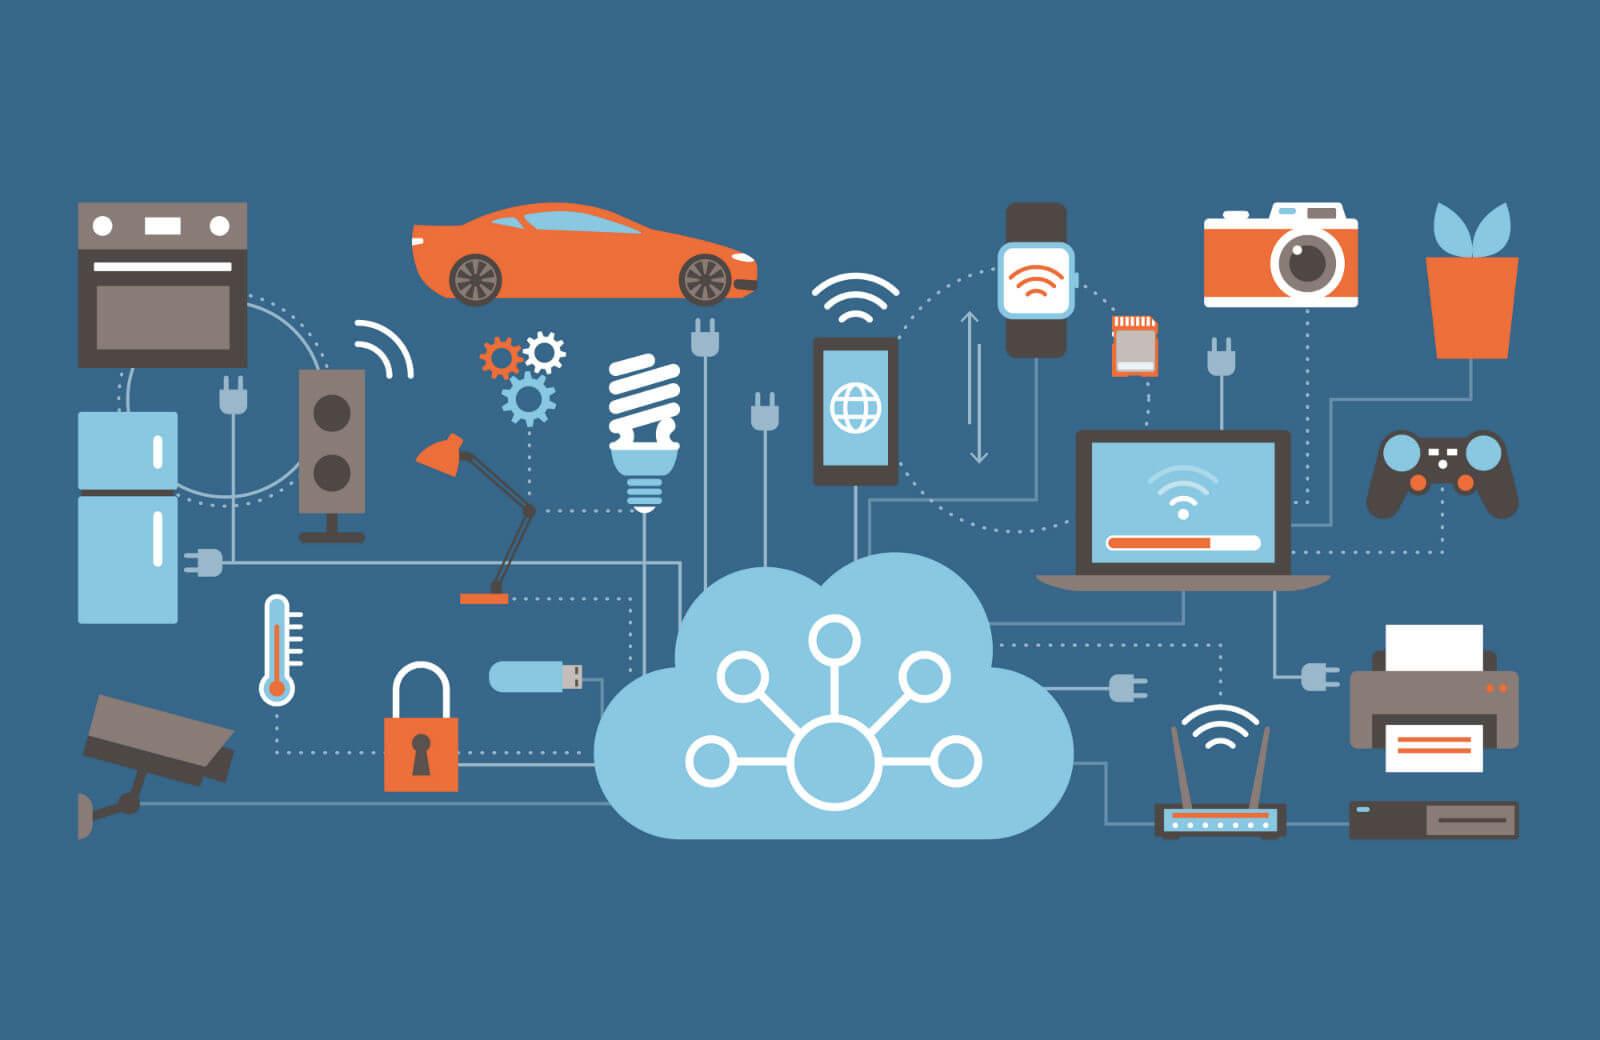 informatiebeveiliging internet of things